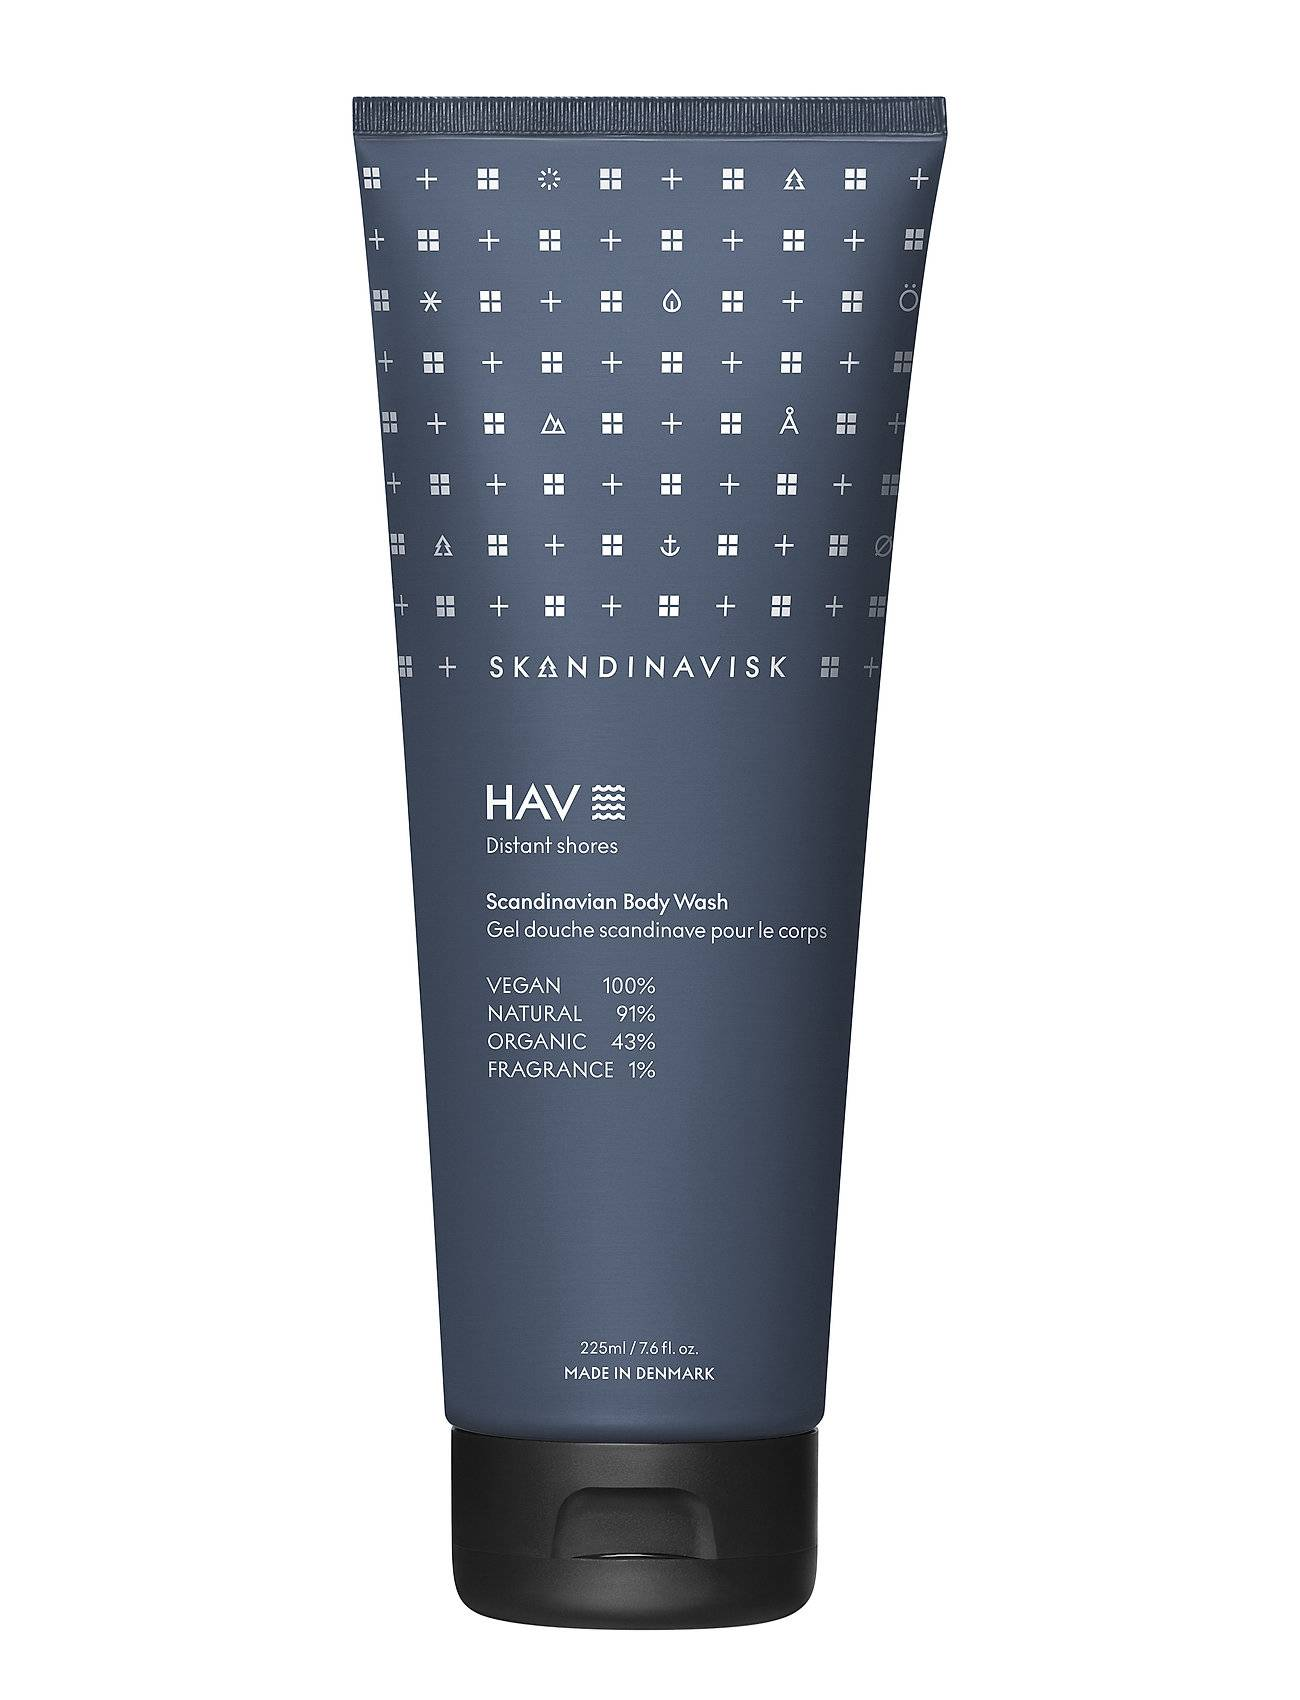 Skandinavisk ØY Body Wash 225ml Beauty MEN Skin Care Body Shower Gel Nude Skandinavisk